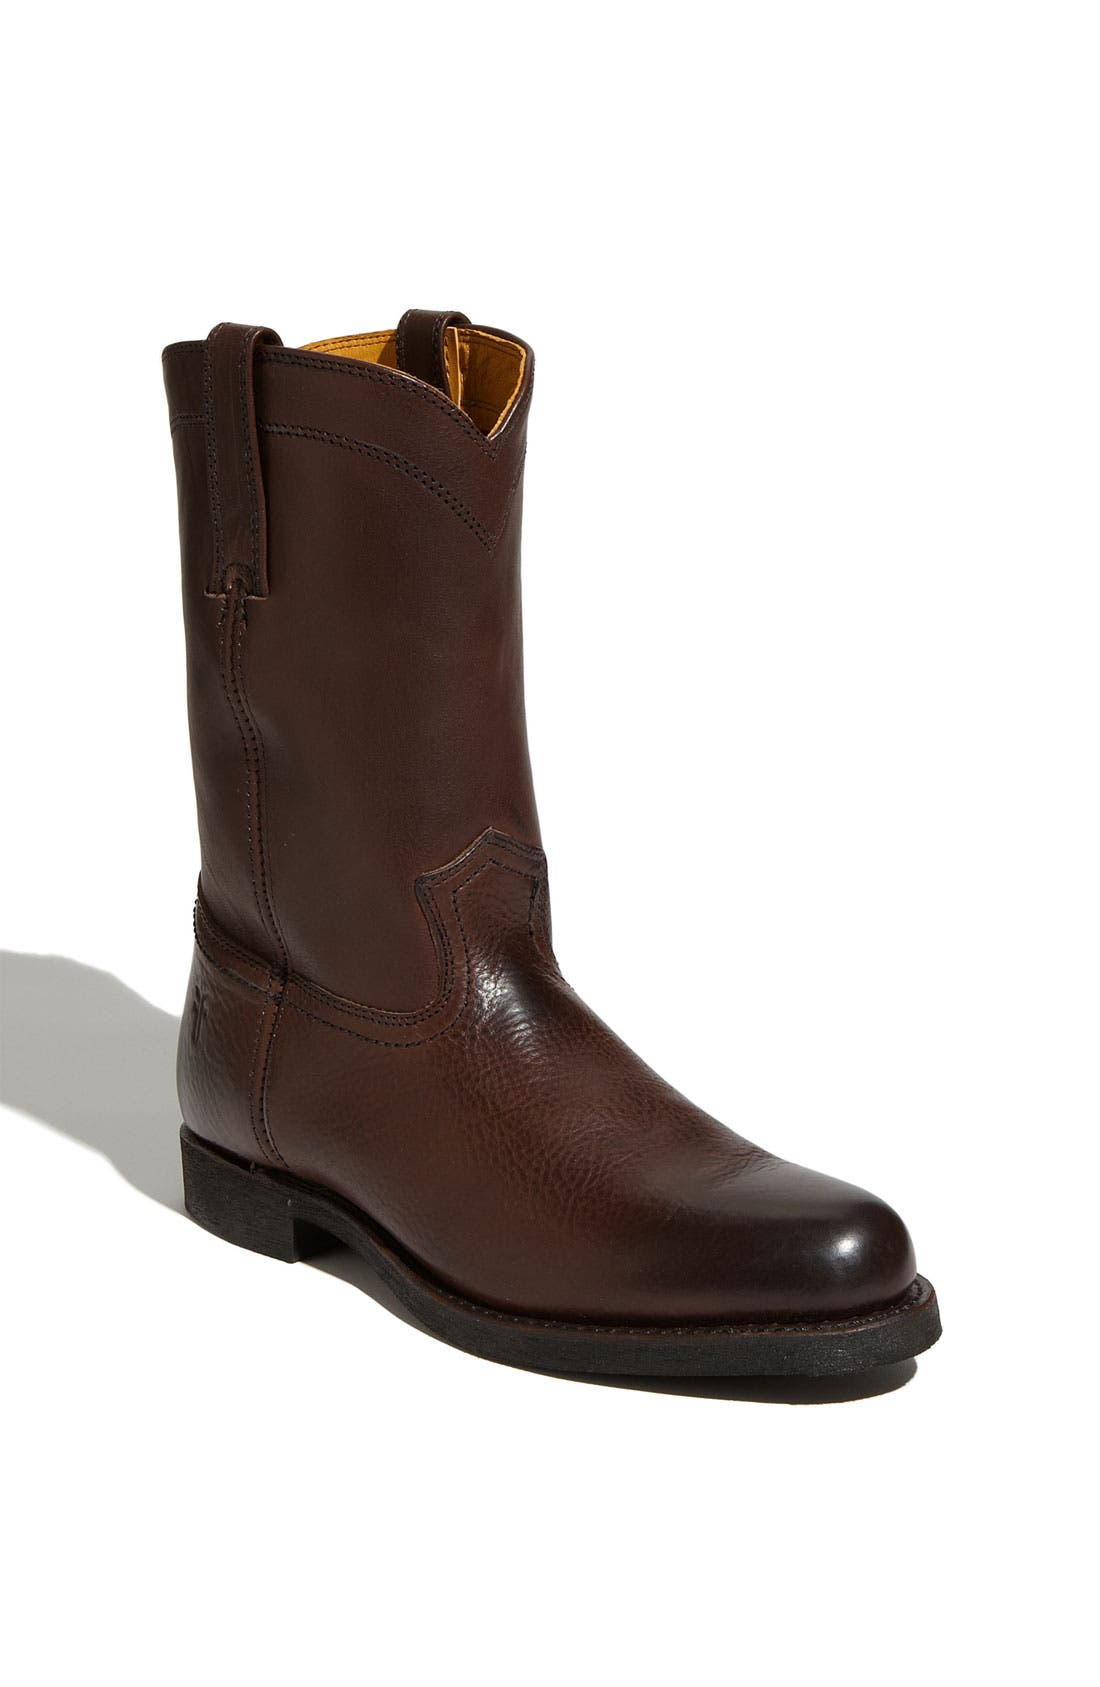 Alternate Image 1 Selected - Frye 'Roper' Boot